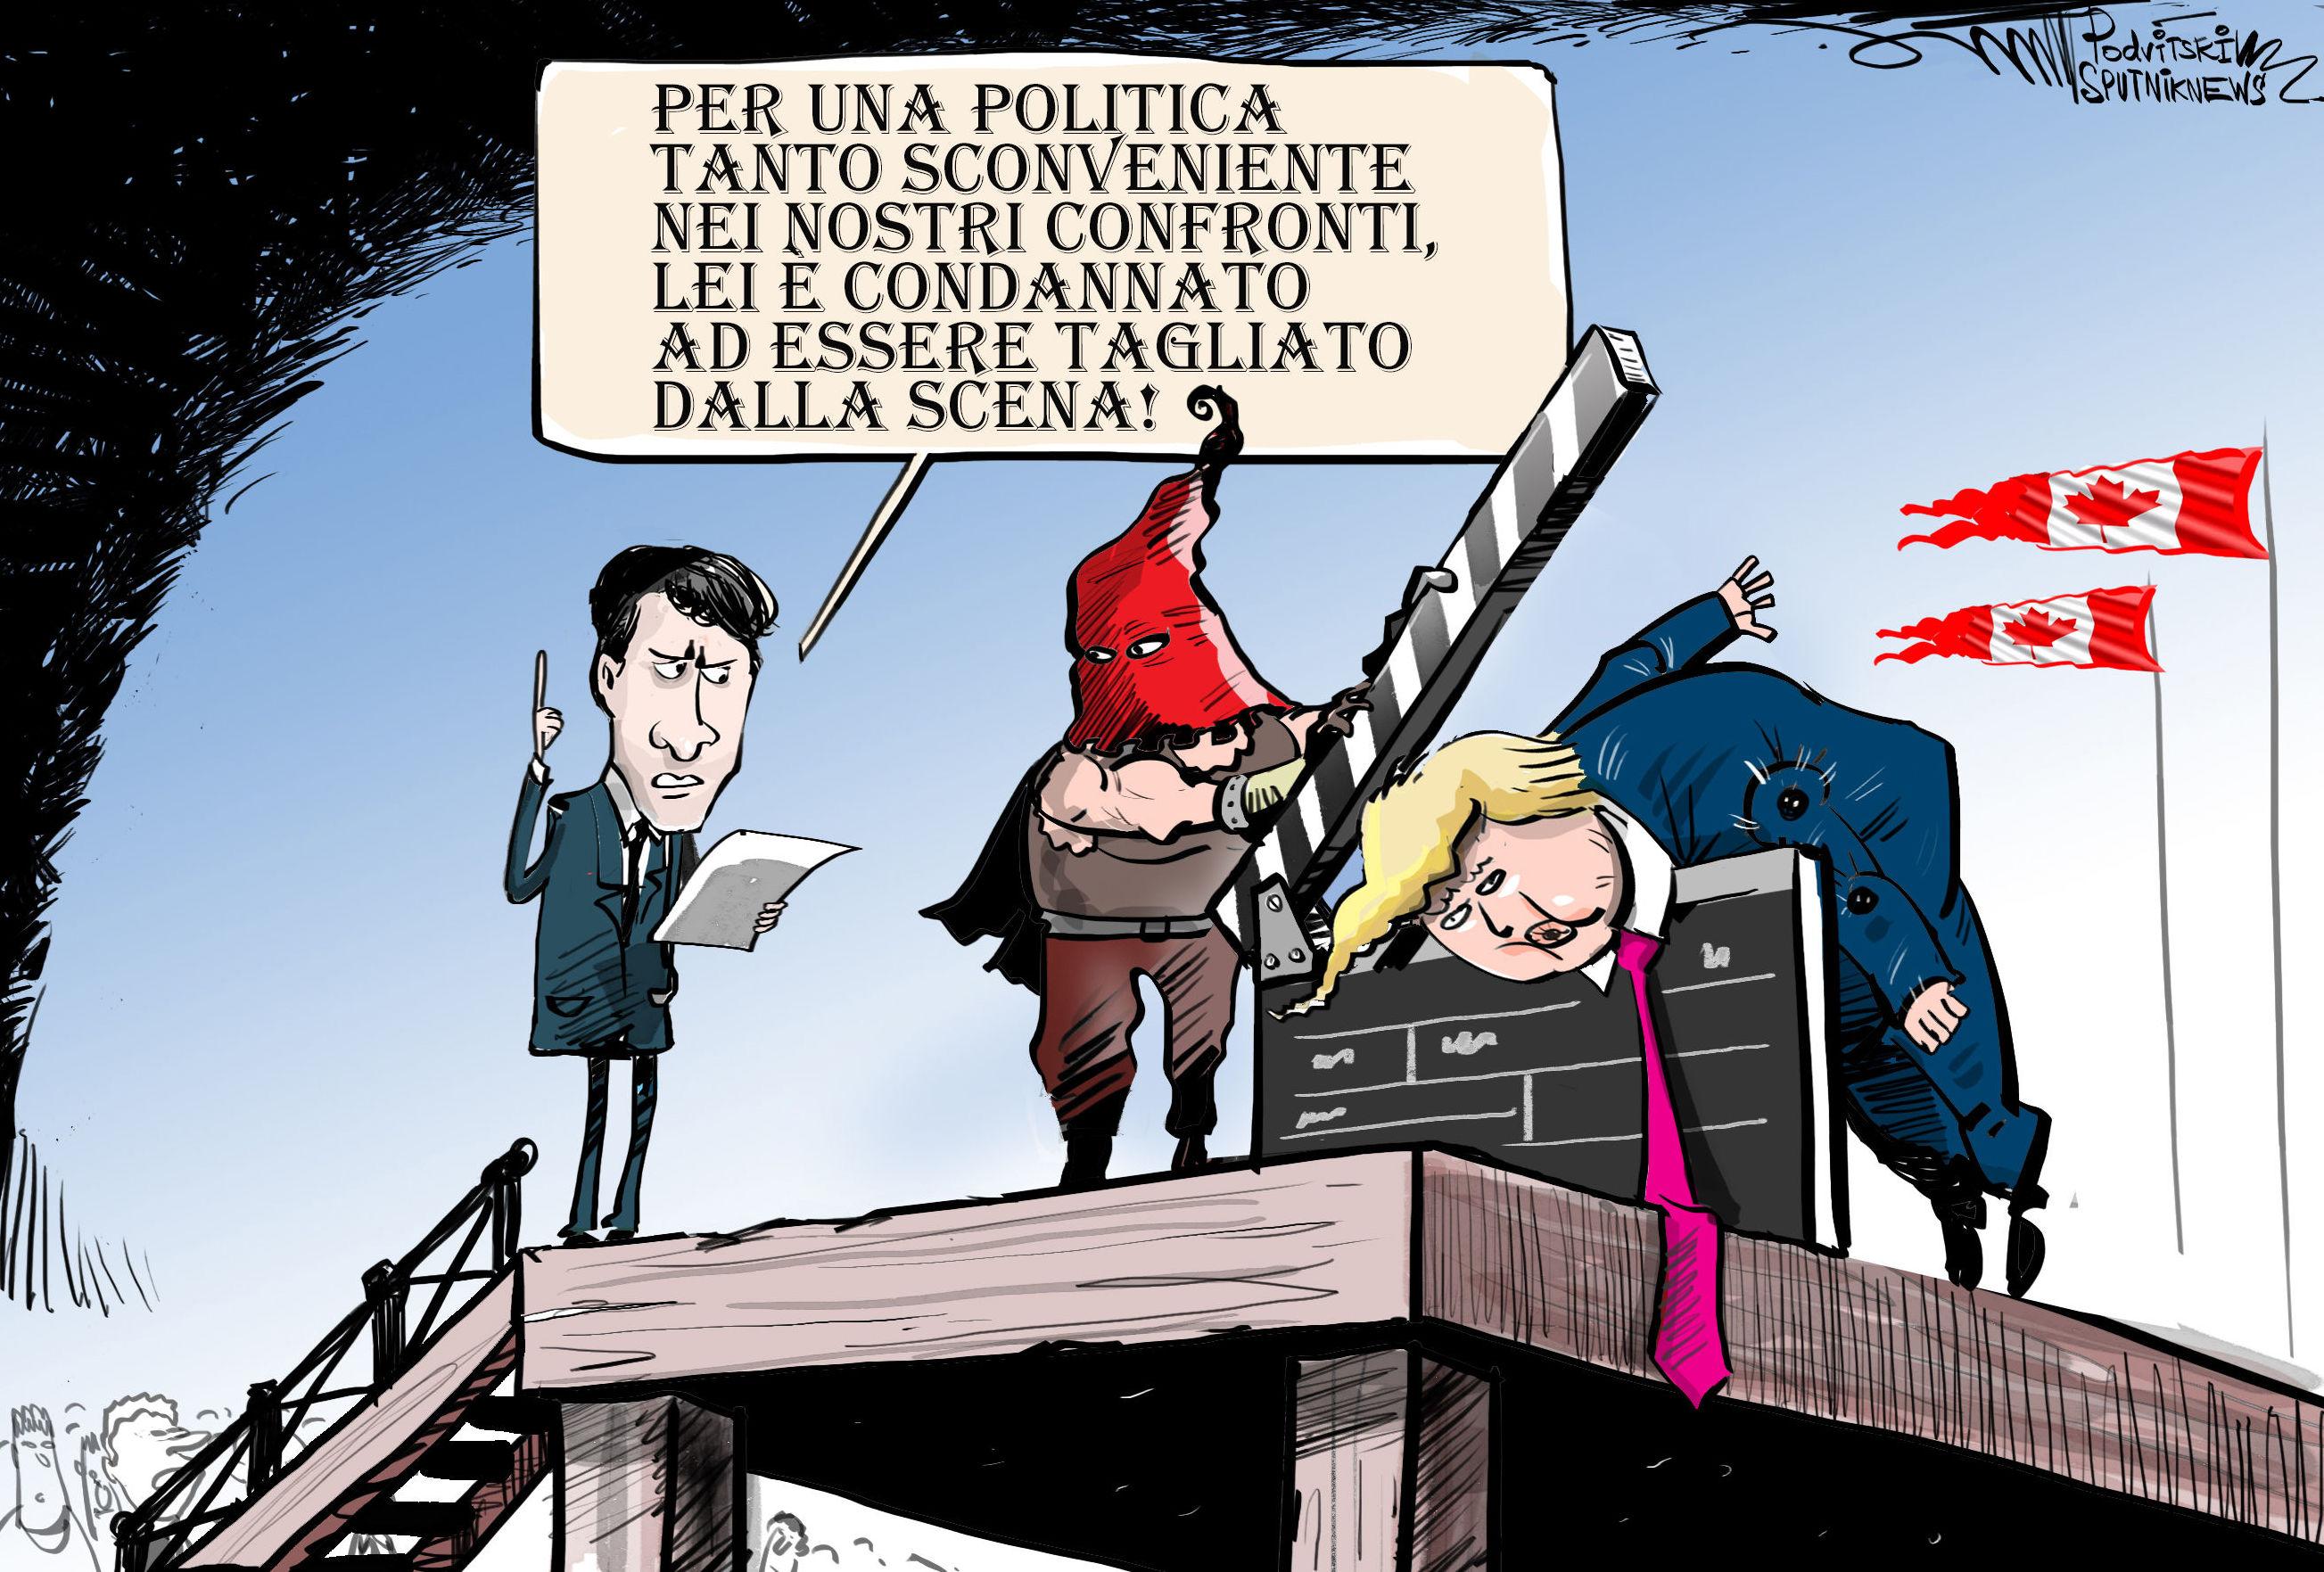 Canada, tagliata scena di Trump in